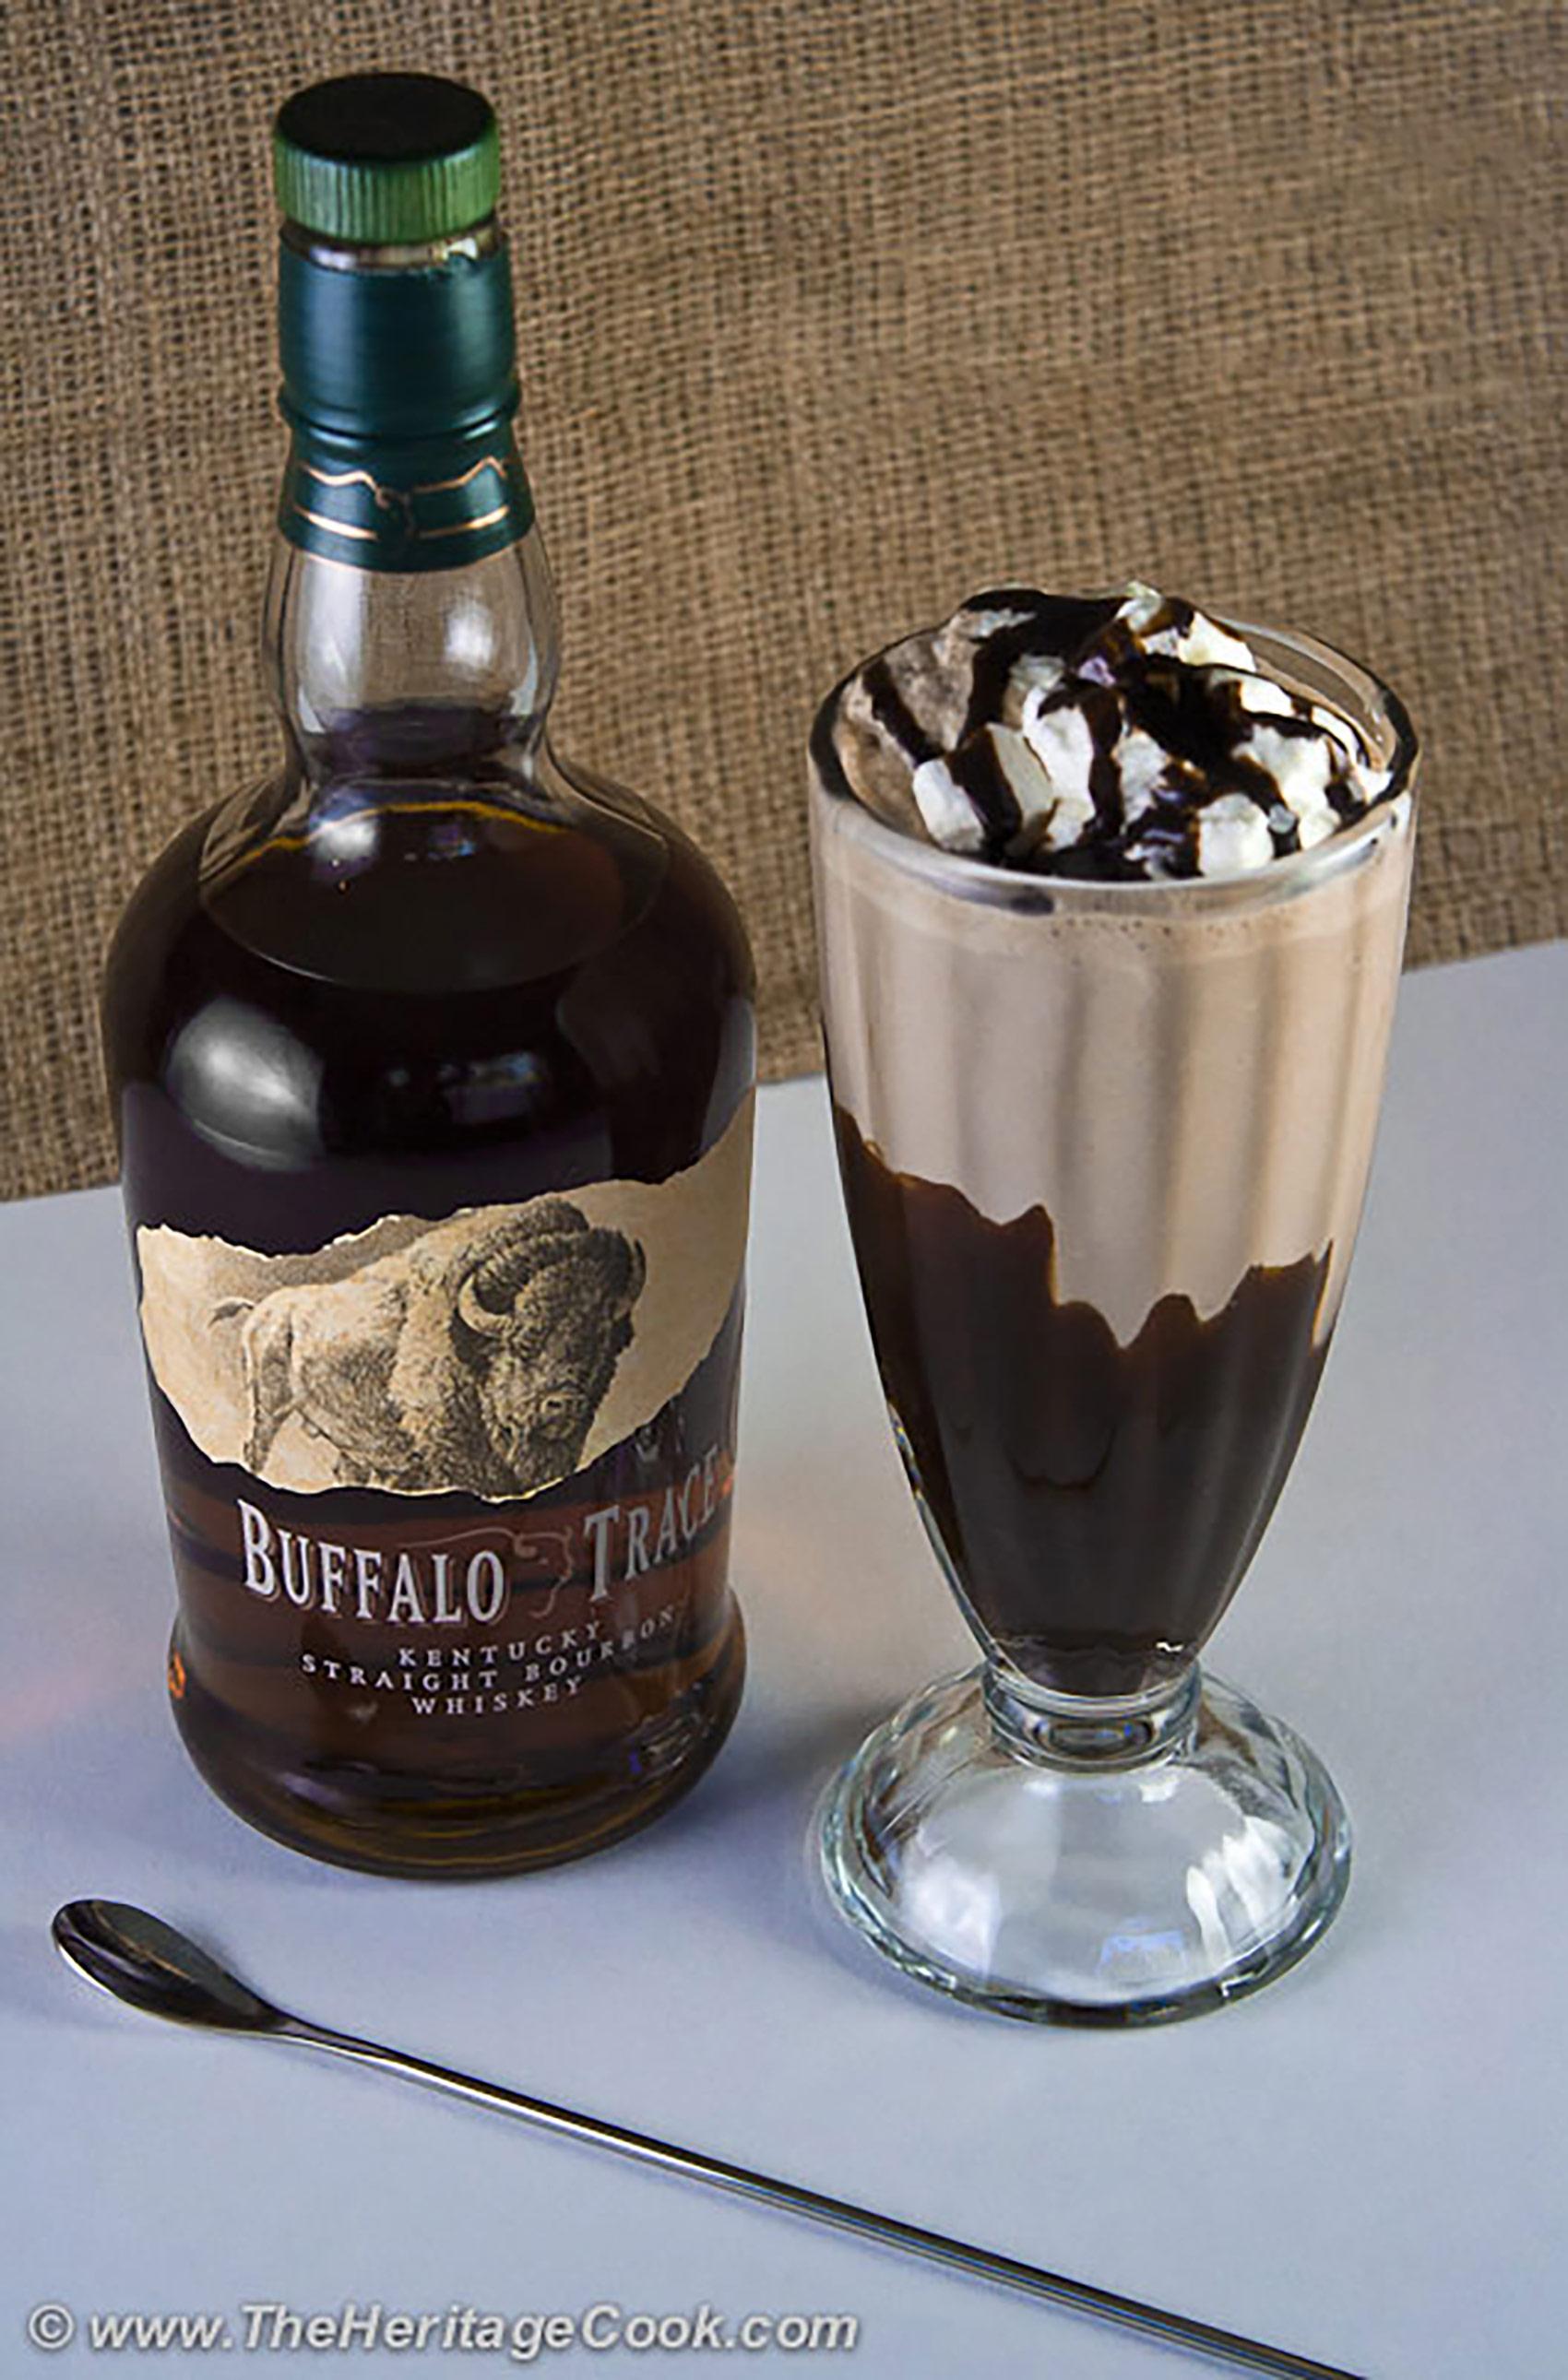 Heritage Cook Napa Chocolate Bourbon Milkshake